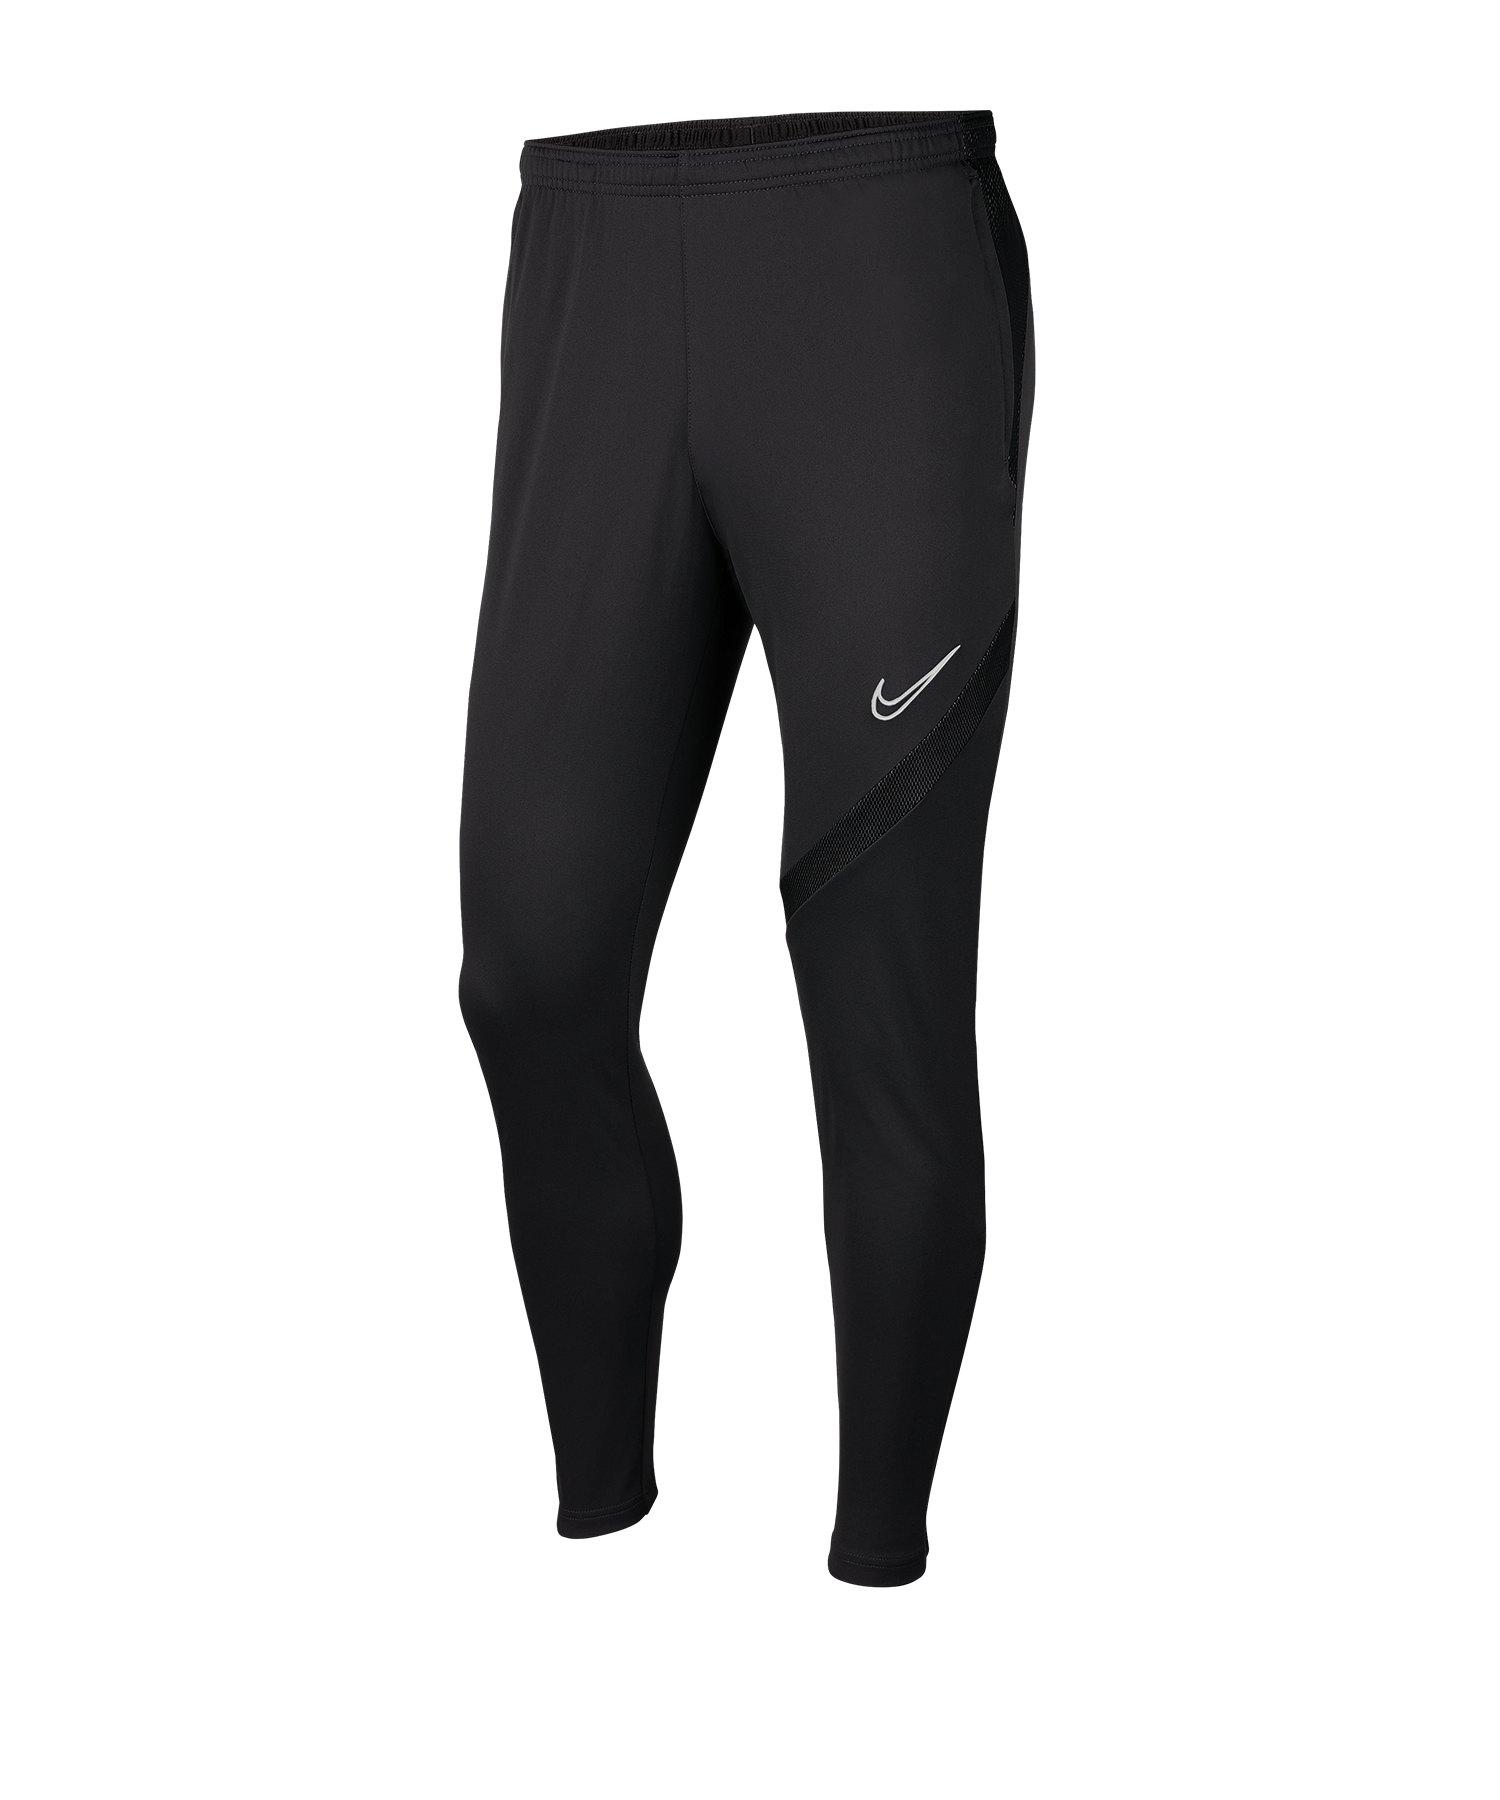 Nike Academy Pro Trainingshose Grau Schwarz F061 - grau